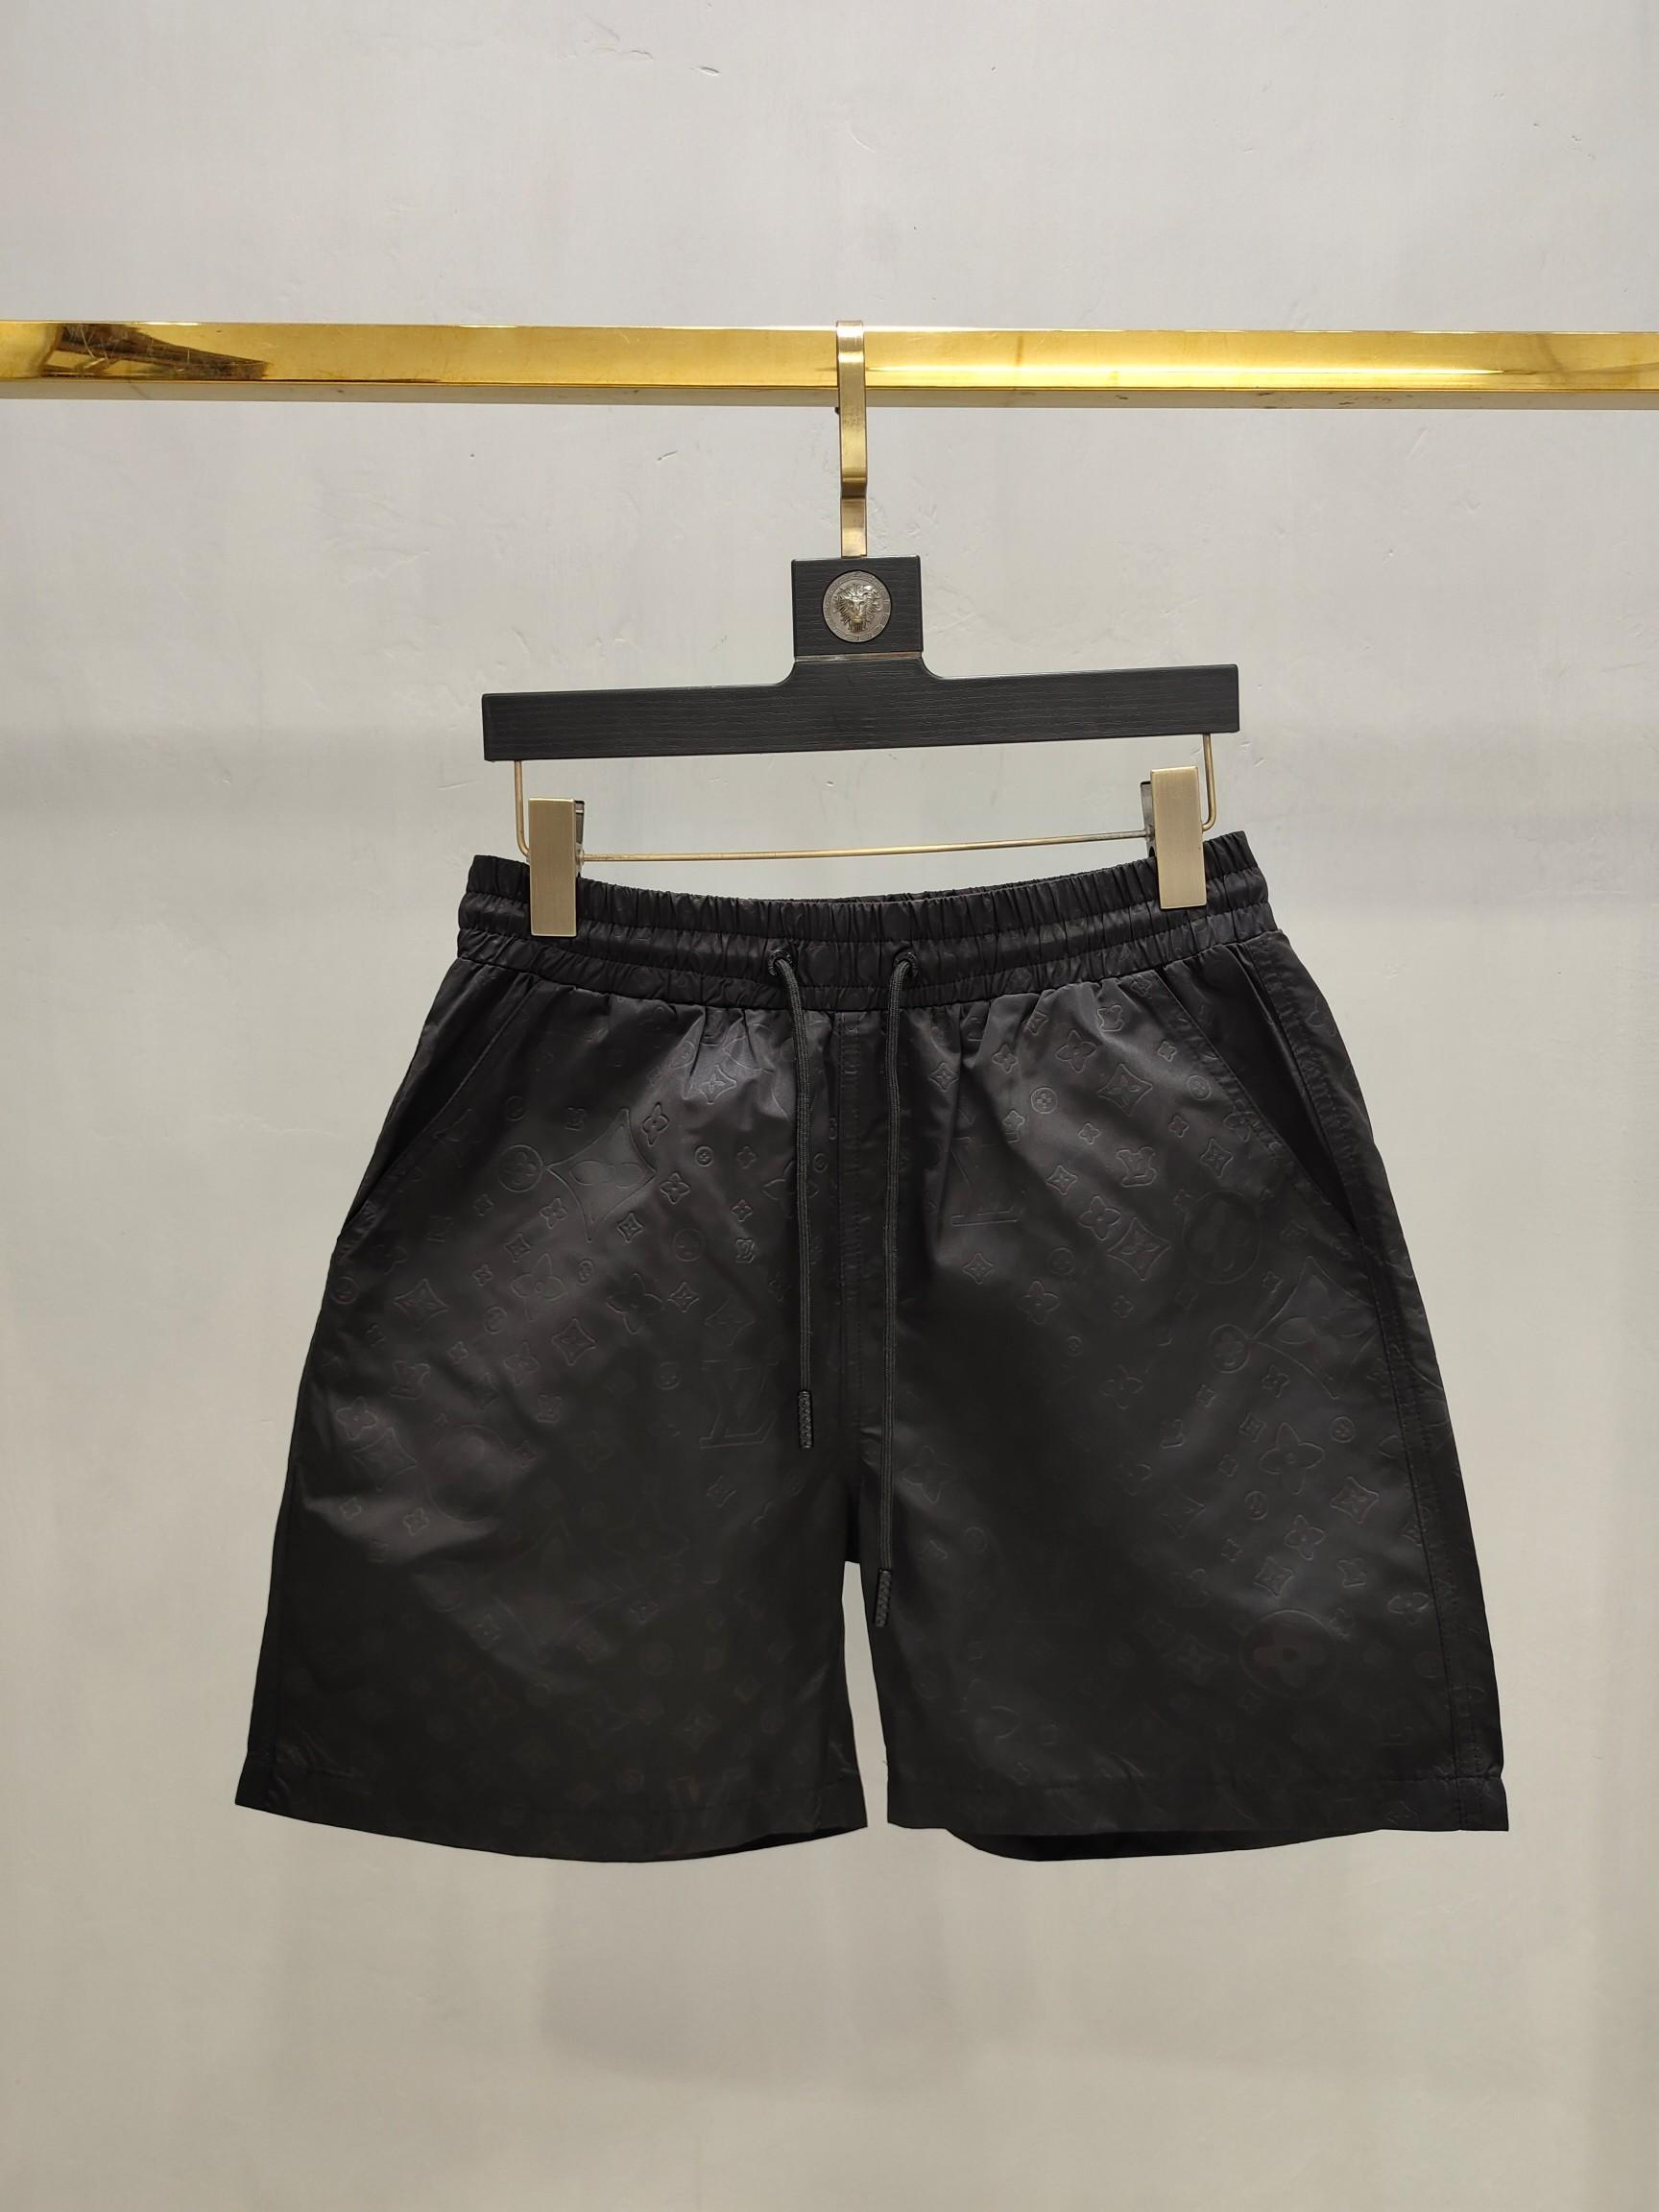 Männer Multi-Tasche Waren Shorts Sommer 2018 Baumwolllose Knielänge Armee Tactical Shorts Männer Casual Straf Sports Hosen ~ SS2